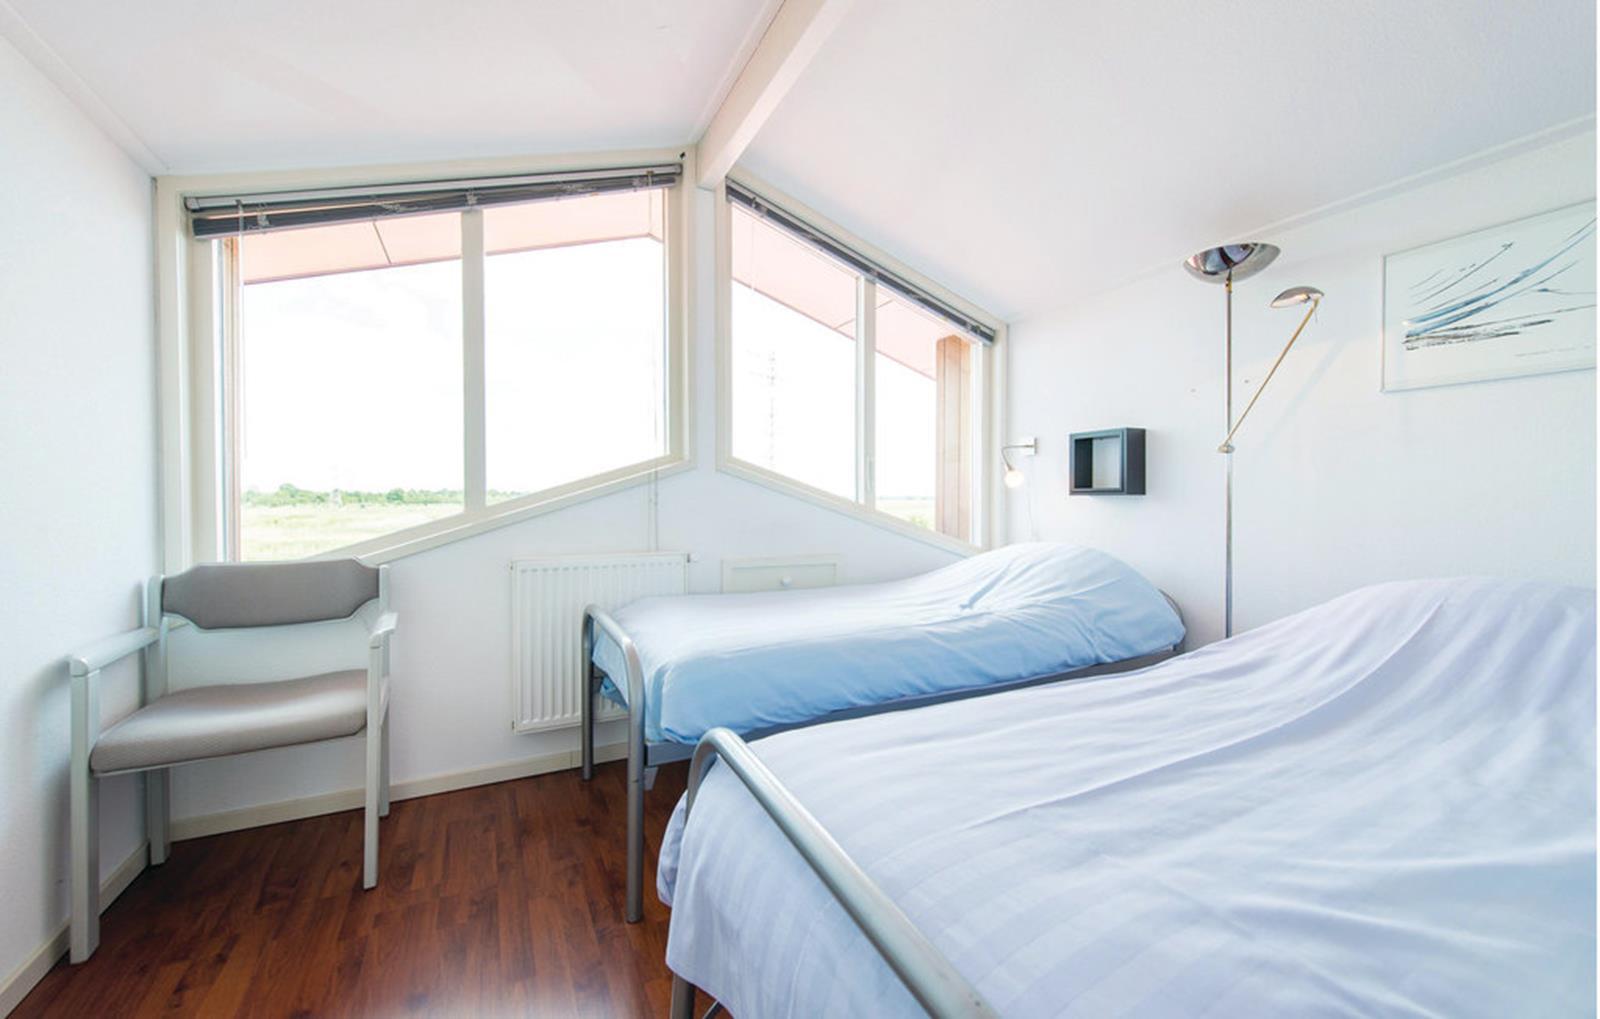 Vakantiehuis te koop Friesland Noardburgum 007.jpg